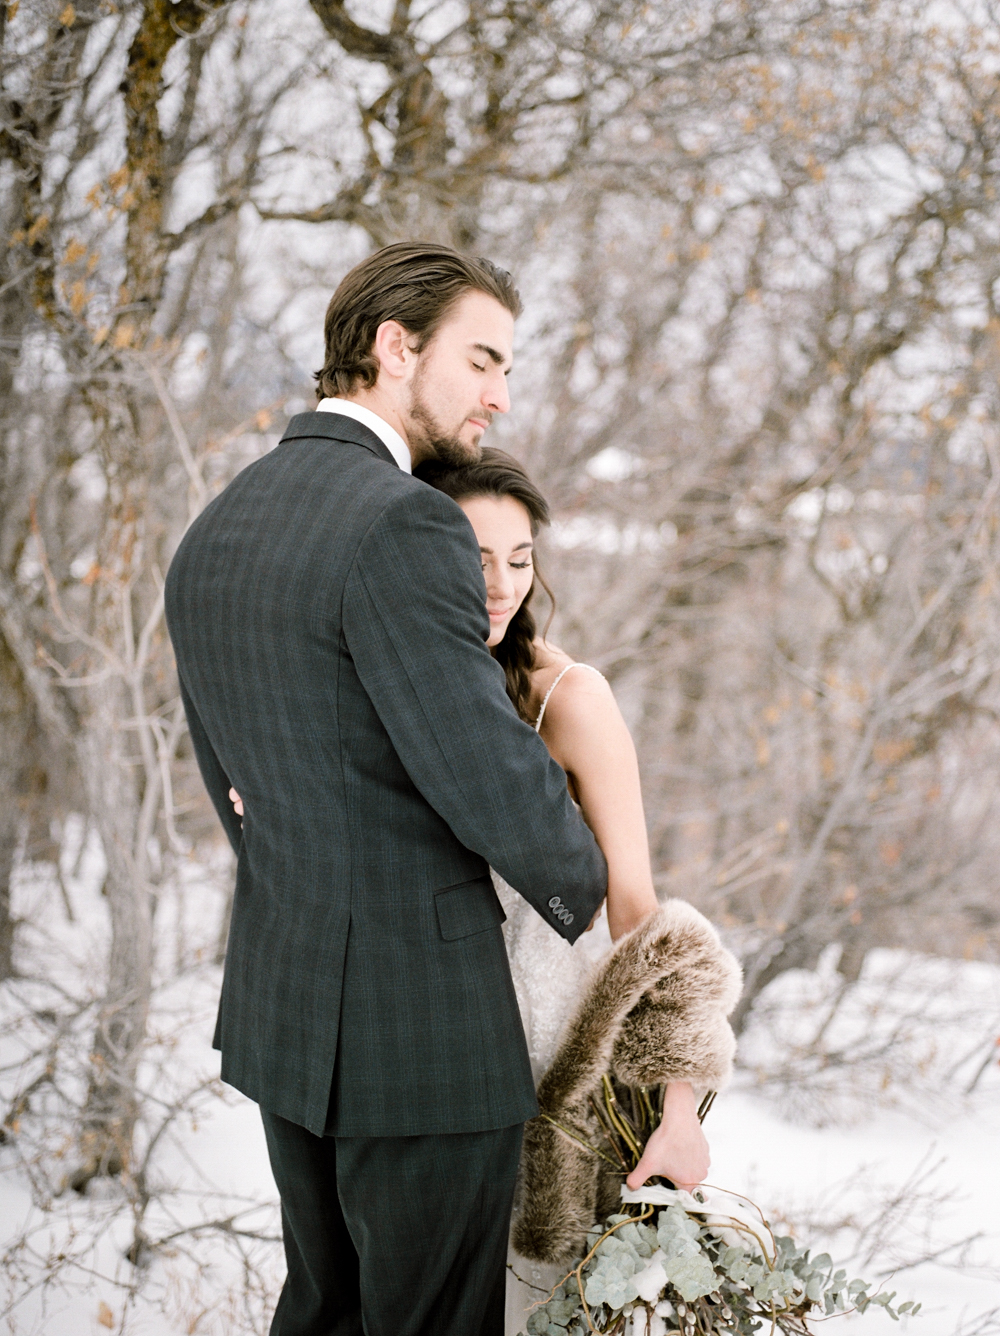 Christine-Gosch-Utah-film-photographer-wedding-mountains-snow-snowy-destination-4.jpg